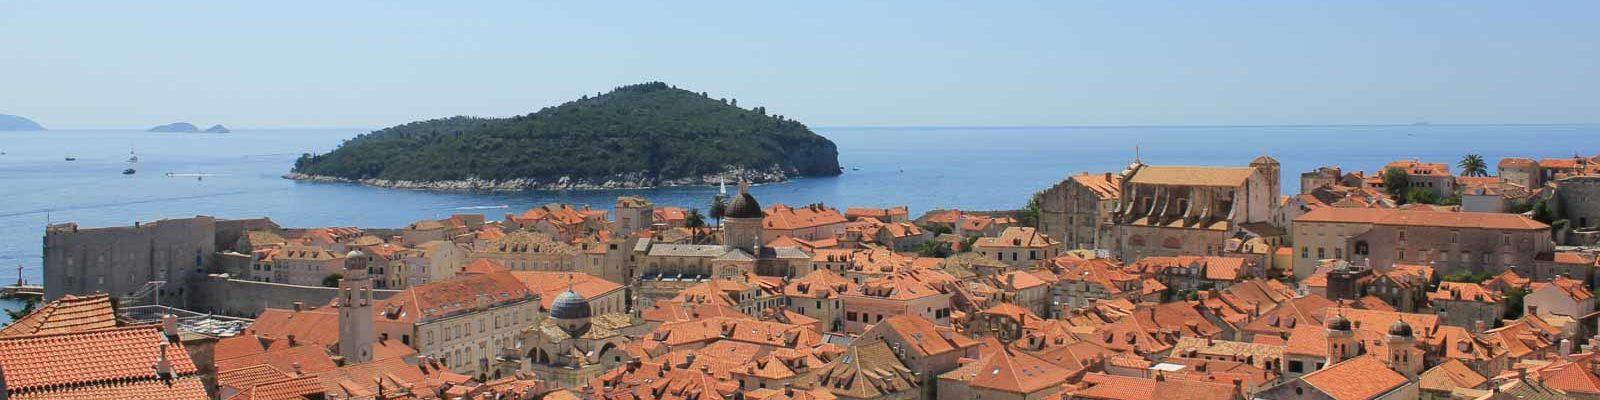 Dubrovnik Lokrum Island strip